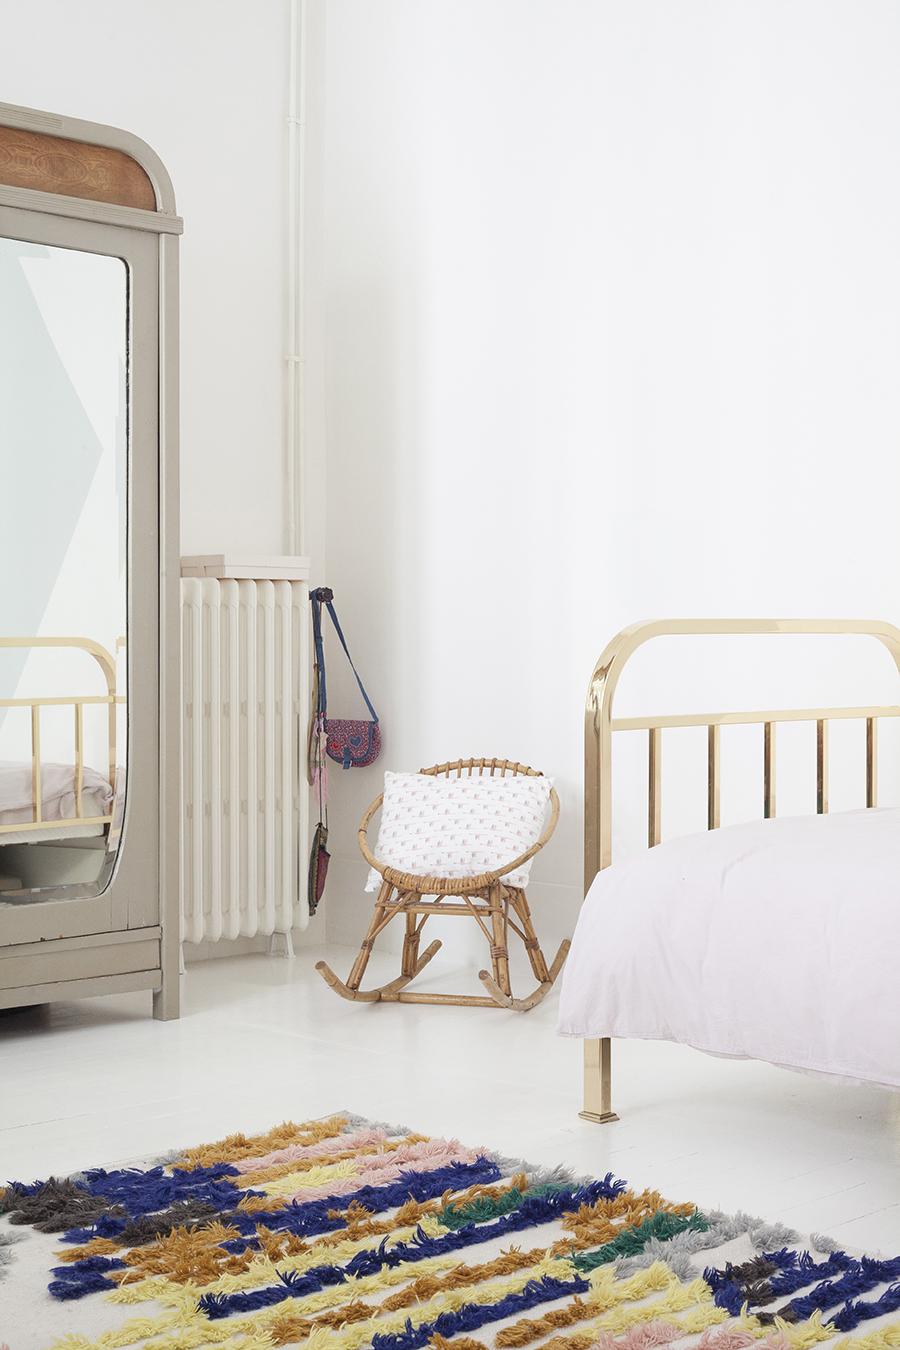 heju_agence_architecture_chambre